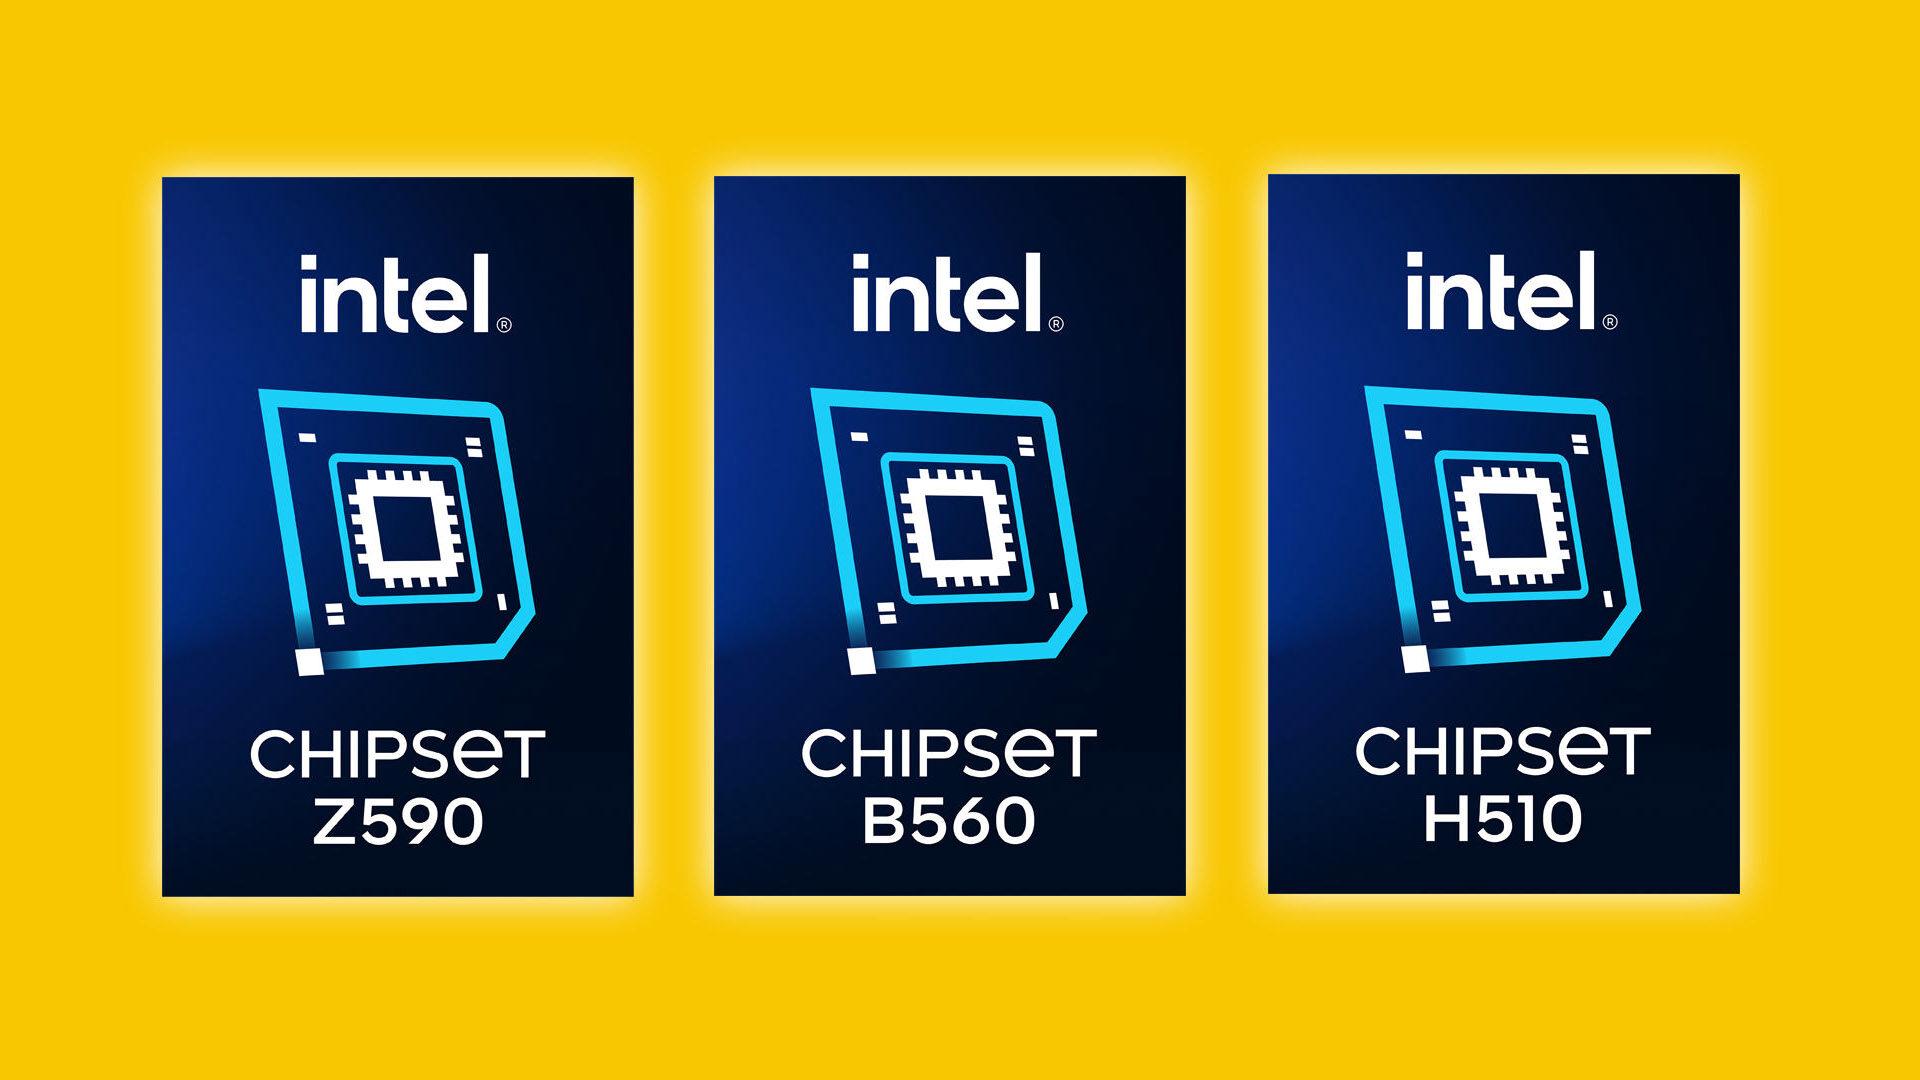 Intel Z590 B560 H510